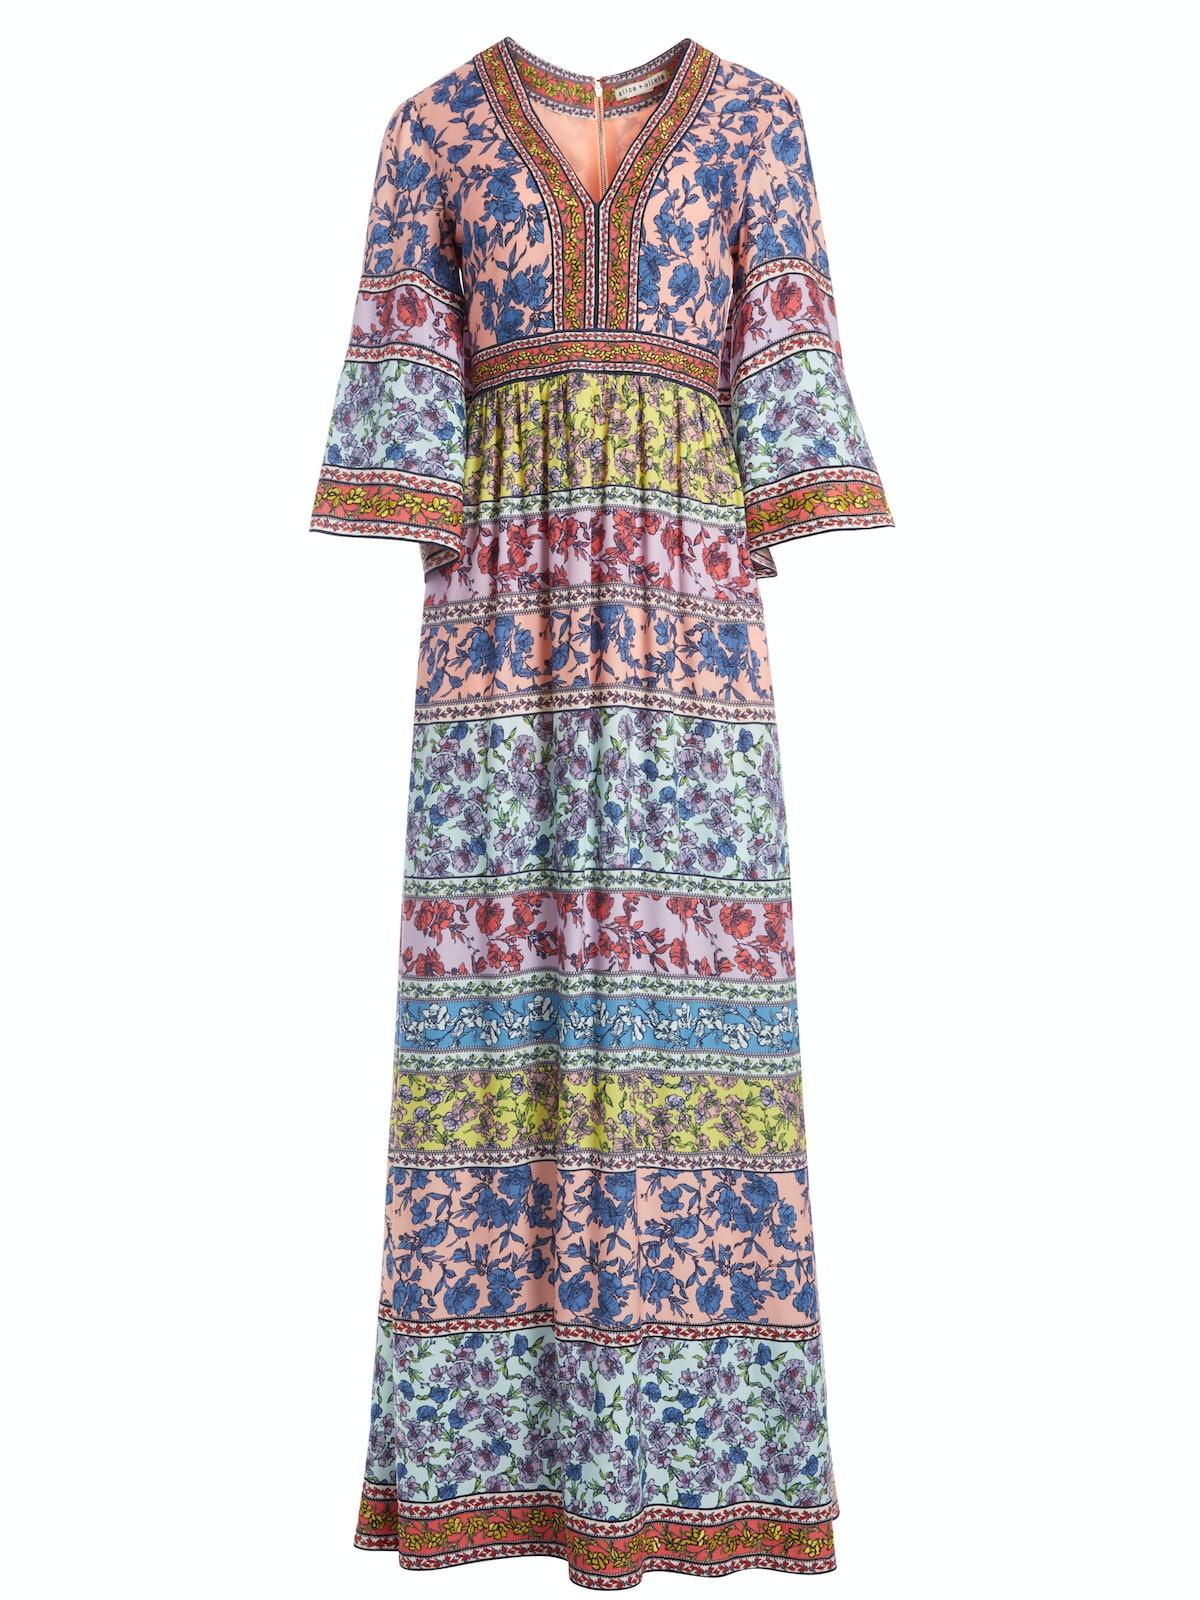 Embroidered Kimono Dress